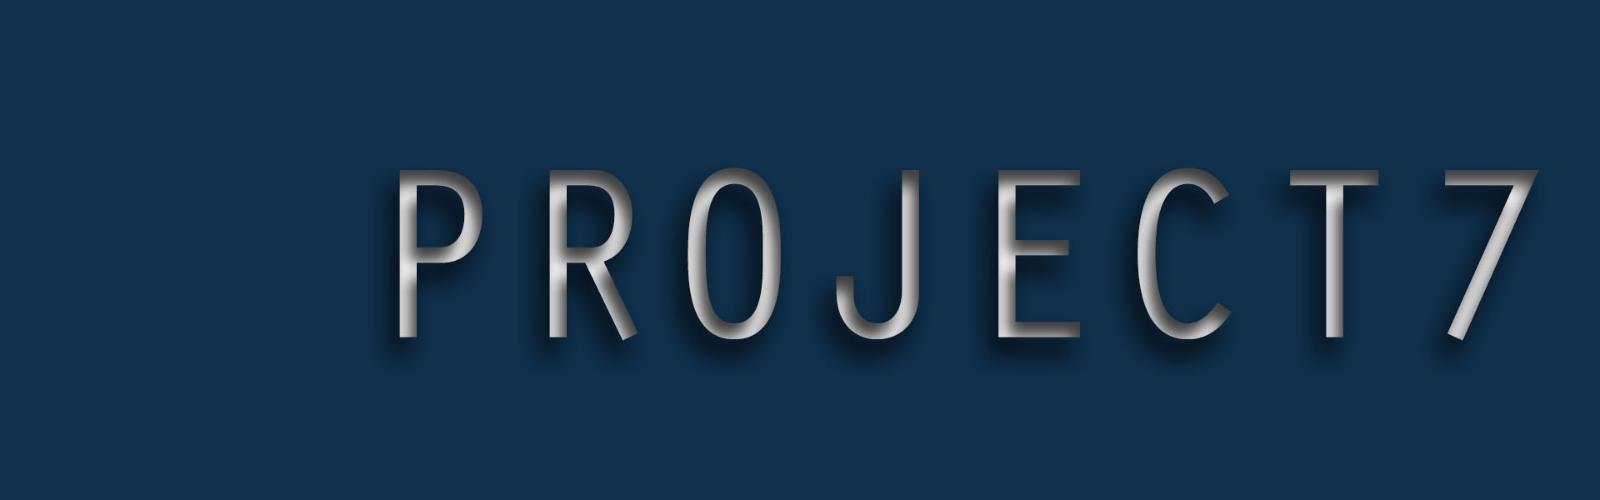 Project7 Banner.jpg